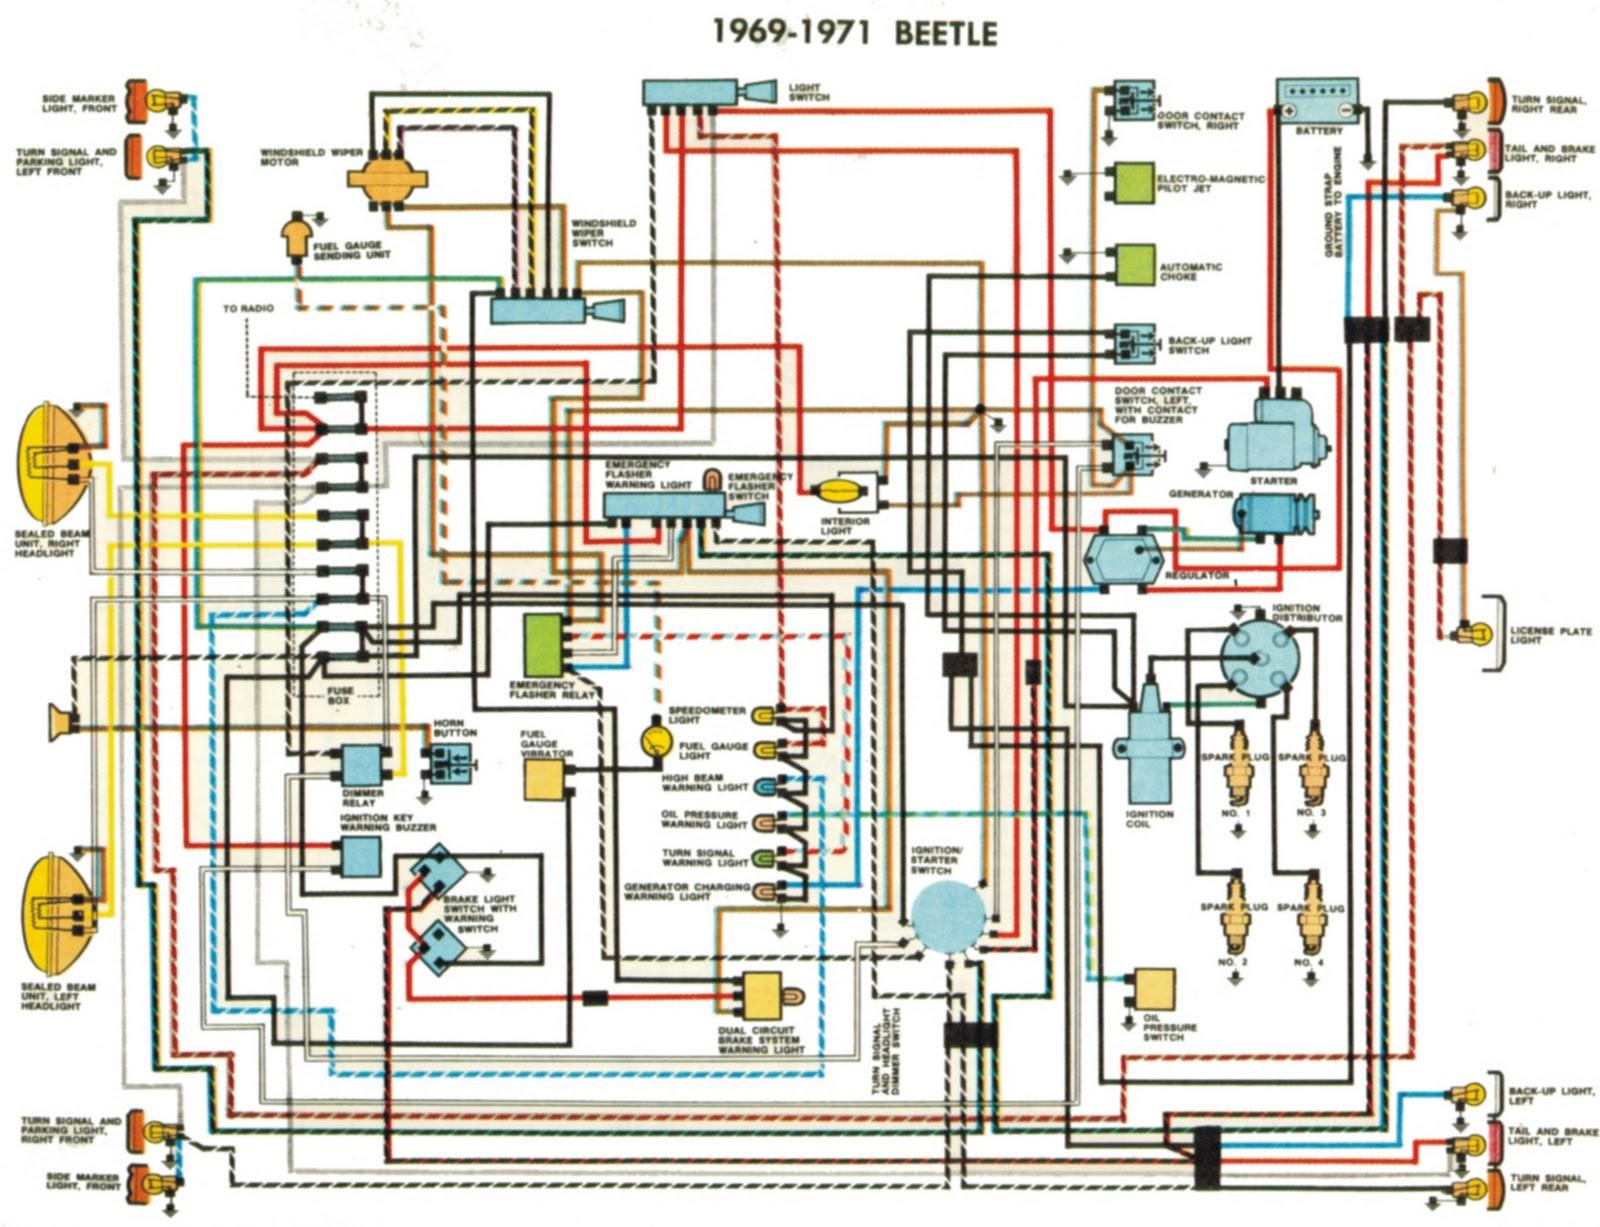 1973 corvette alternator wiring diagram me 2240  1963 beetle wiring diagram download diagram  me 2240  1963 beetle wiring diagram